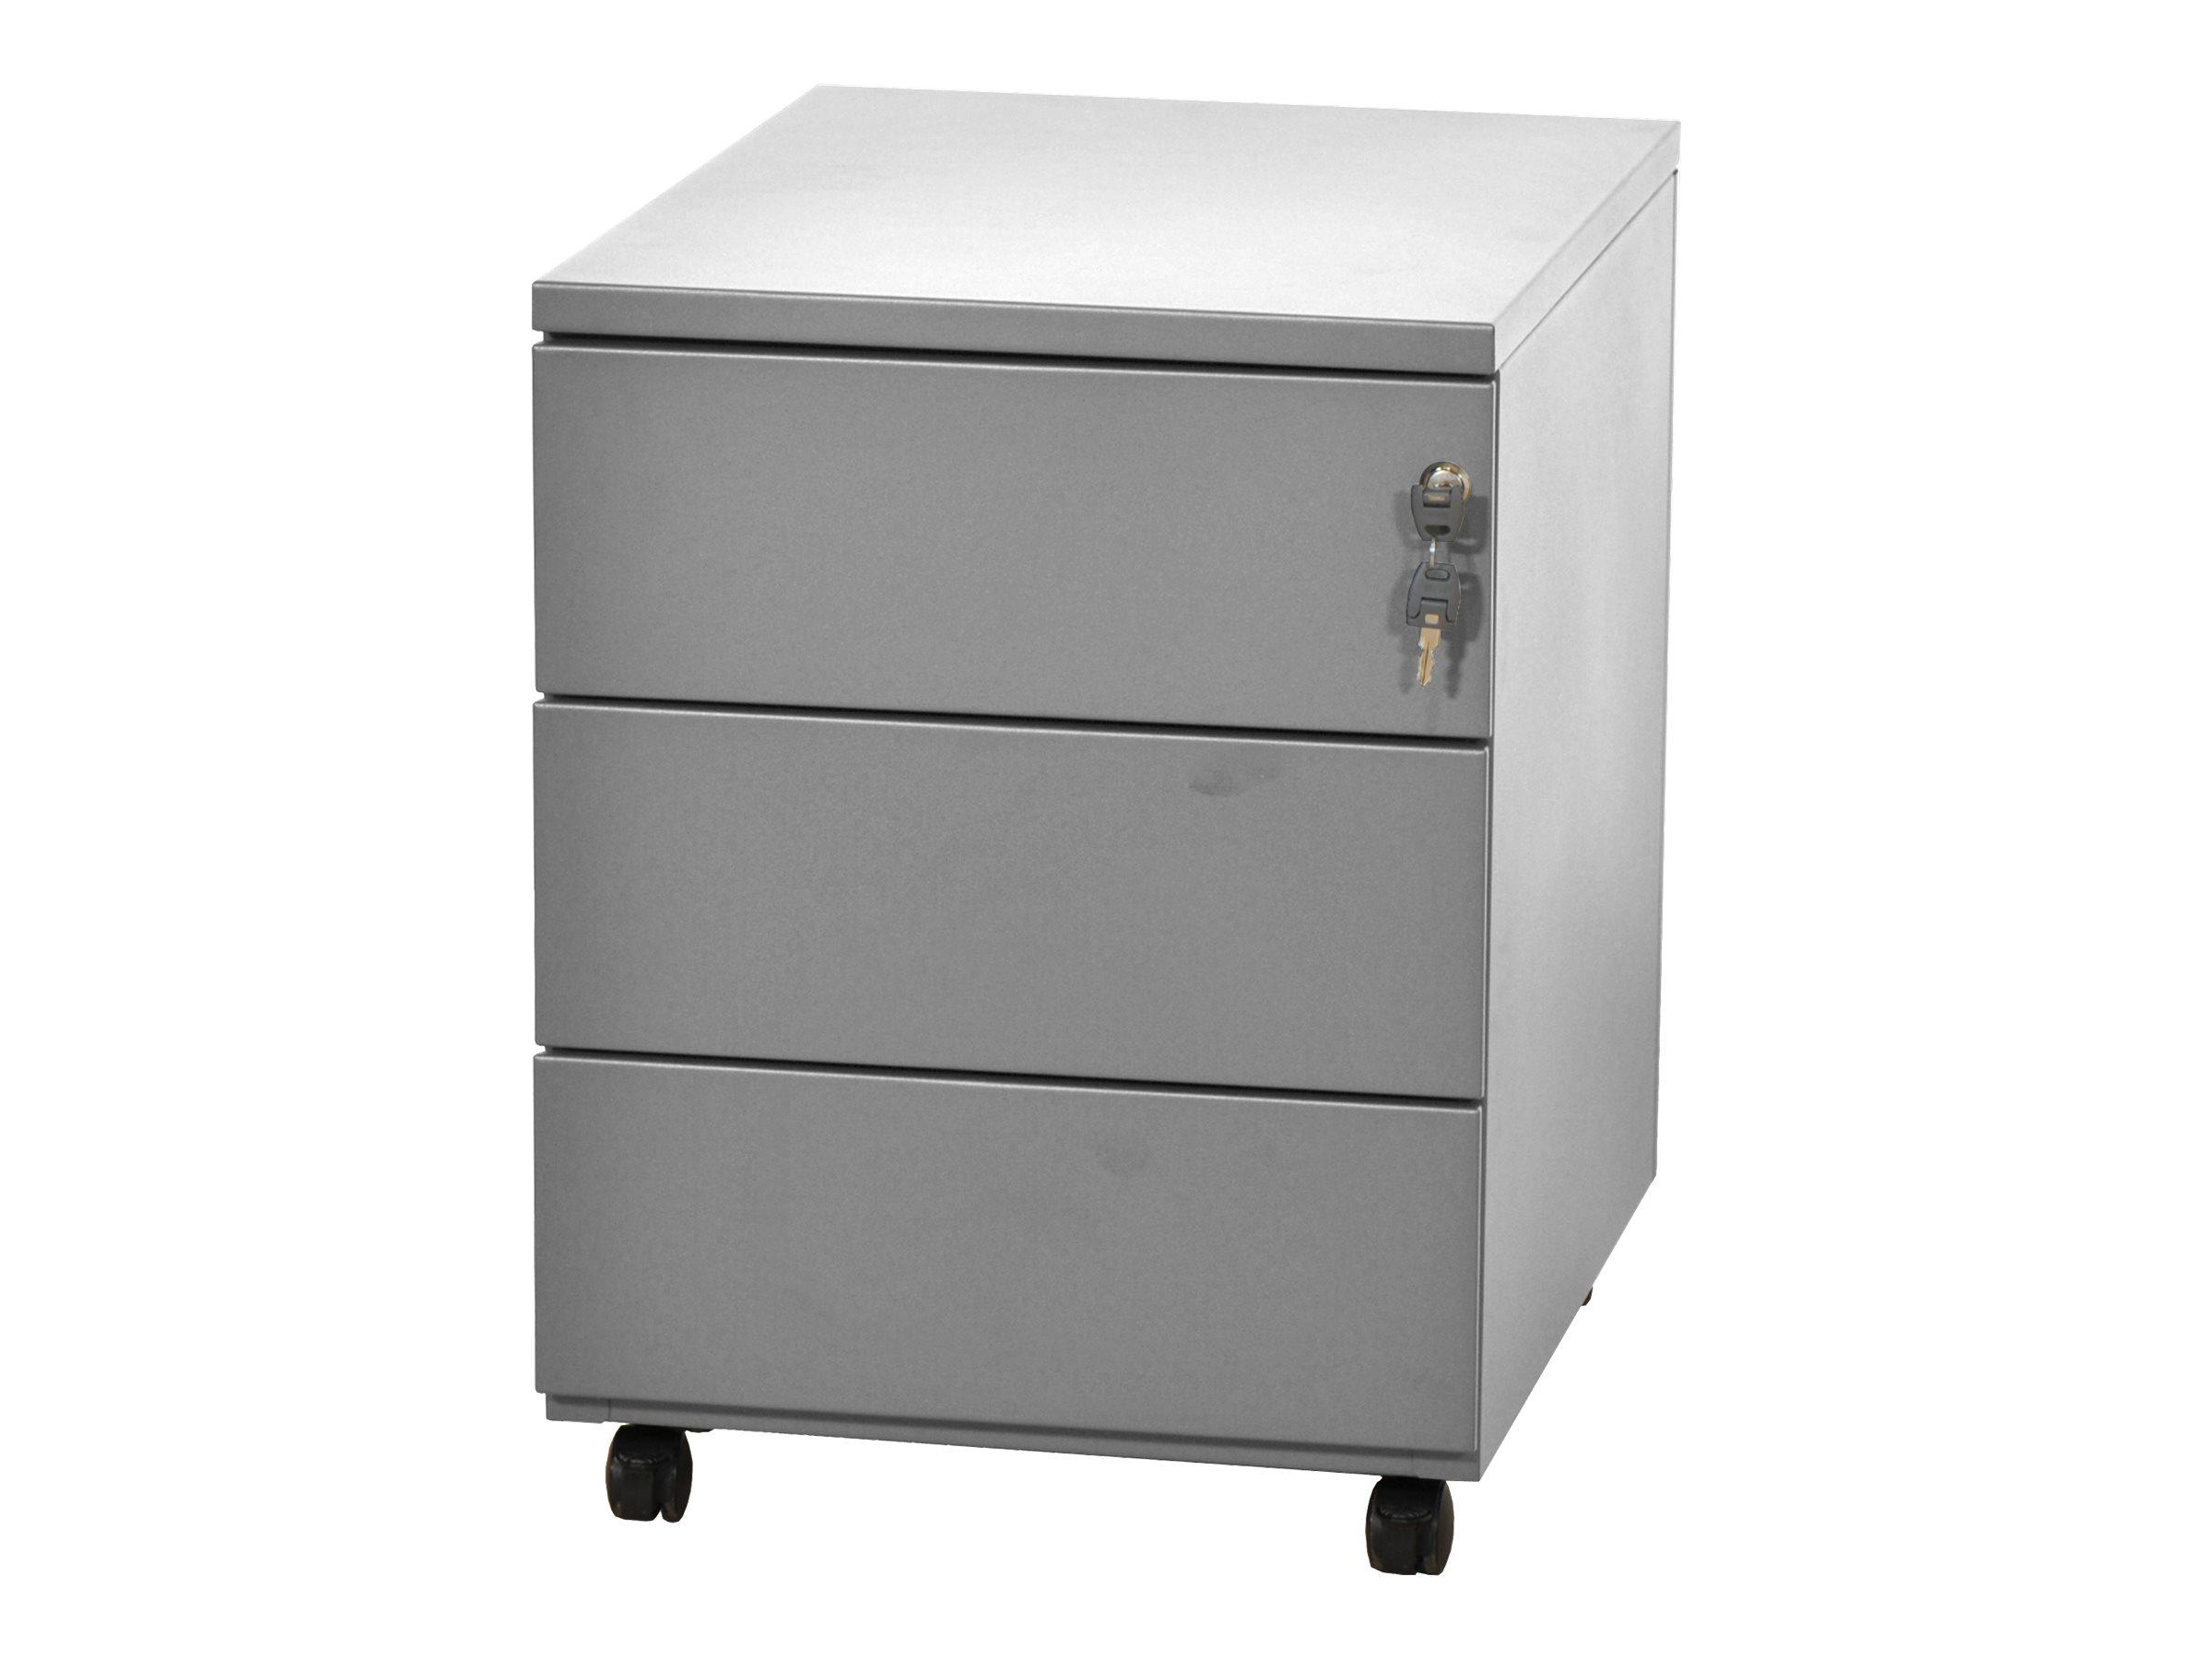 Caisson mobile - 3 tiroirs - aluminium - 56,7 x 54,1 x 41,8 cm